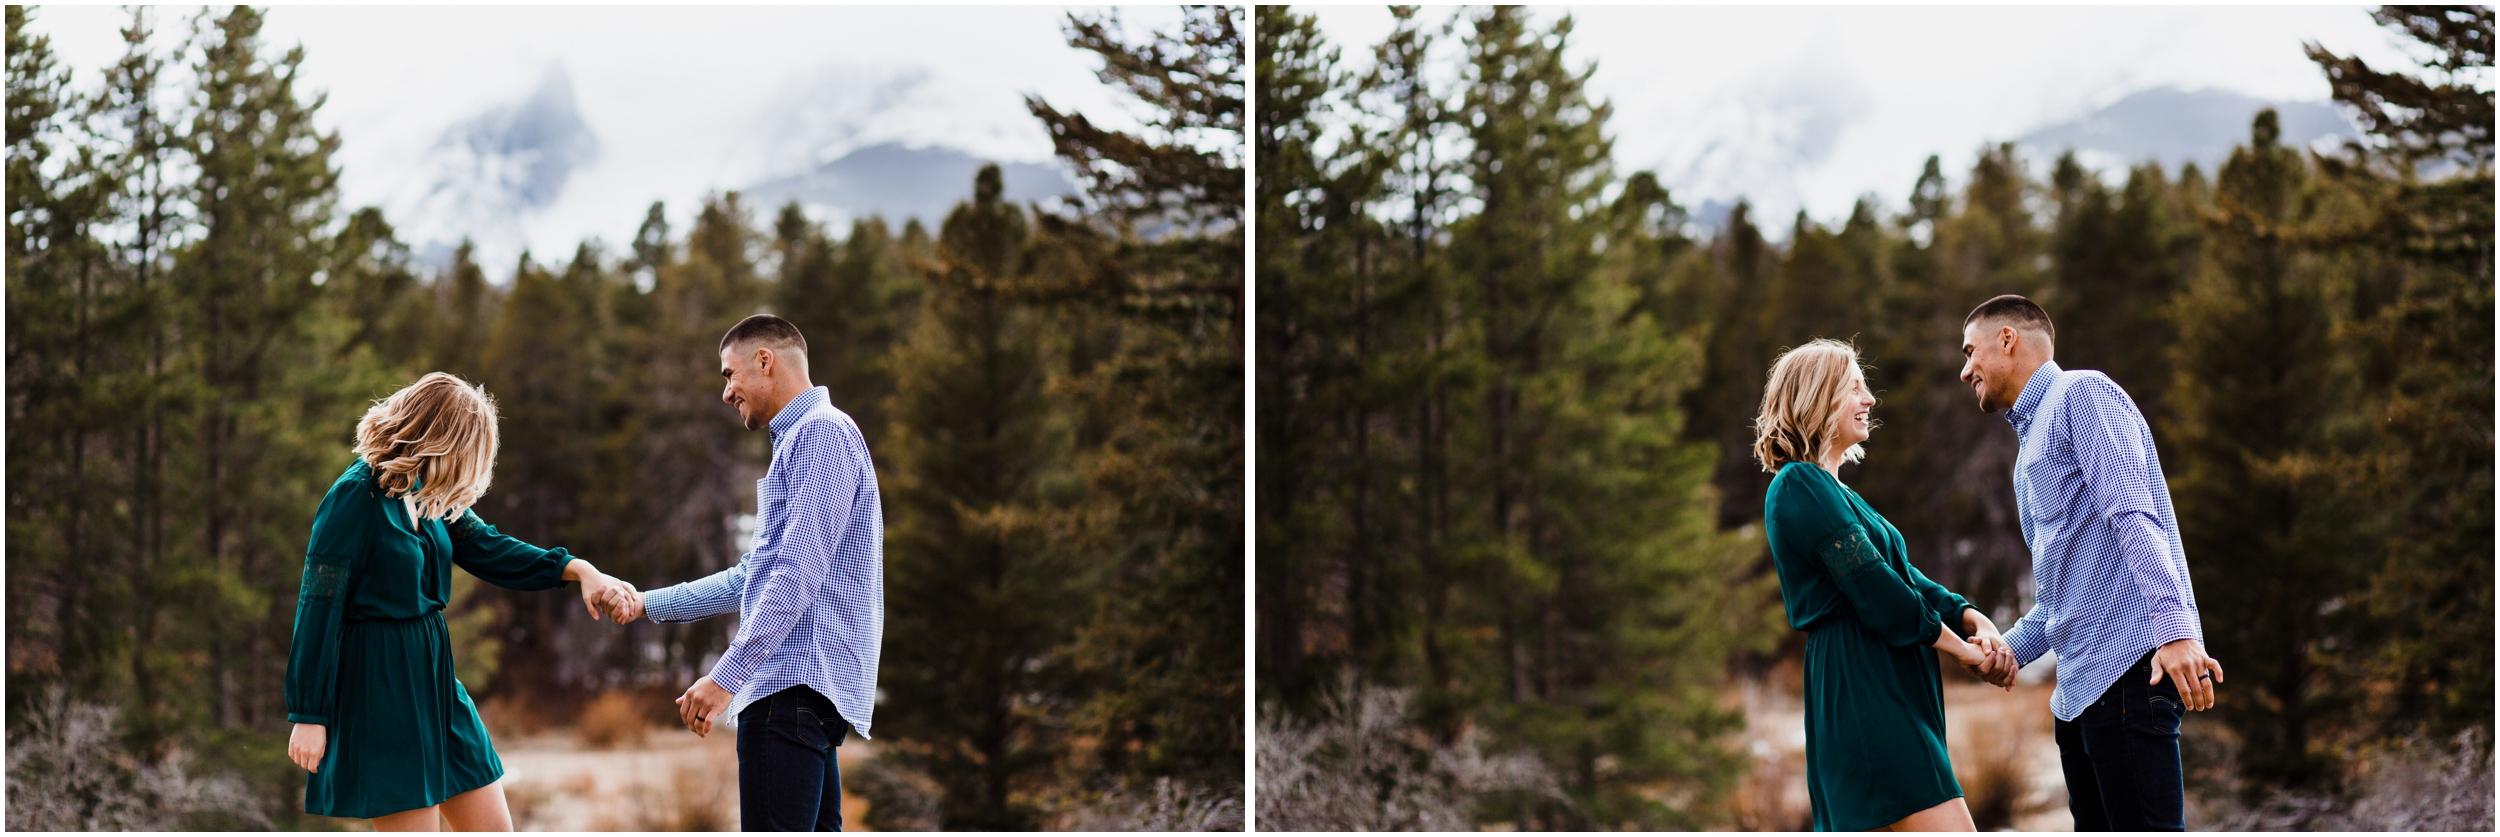 rocky-mountain-national-park-elopement-sprague-lake-colorado-adventure-wedding-photographer_taylor-powers_94.jpg